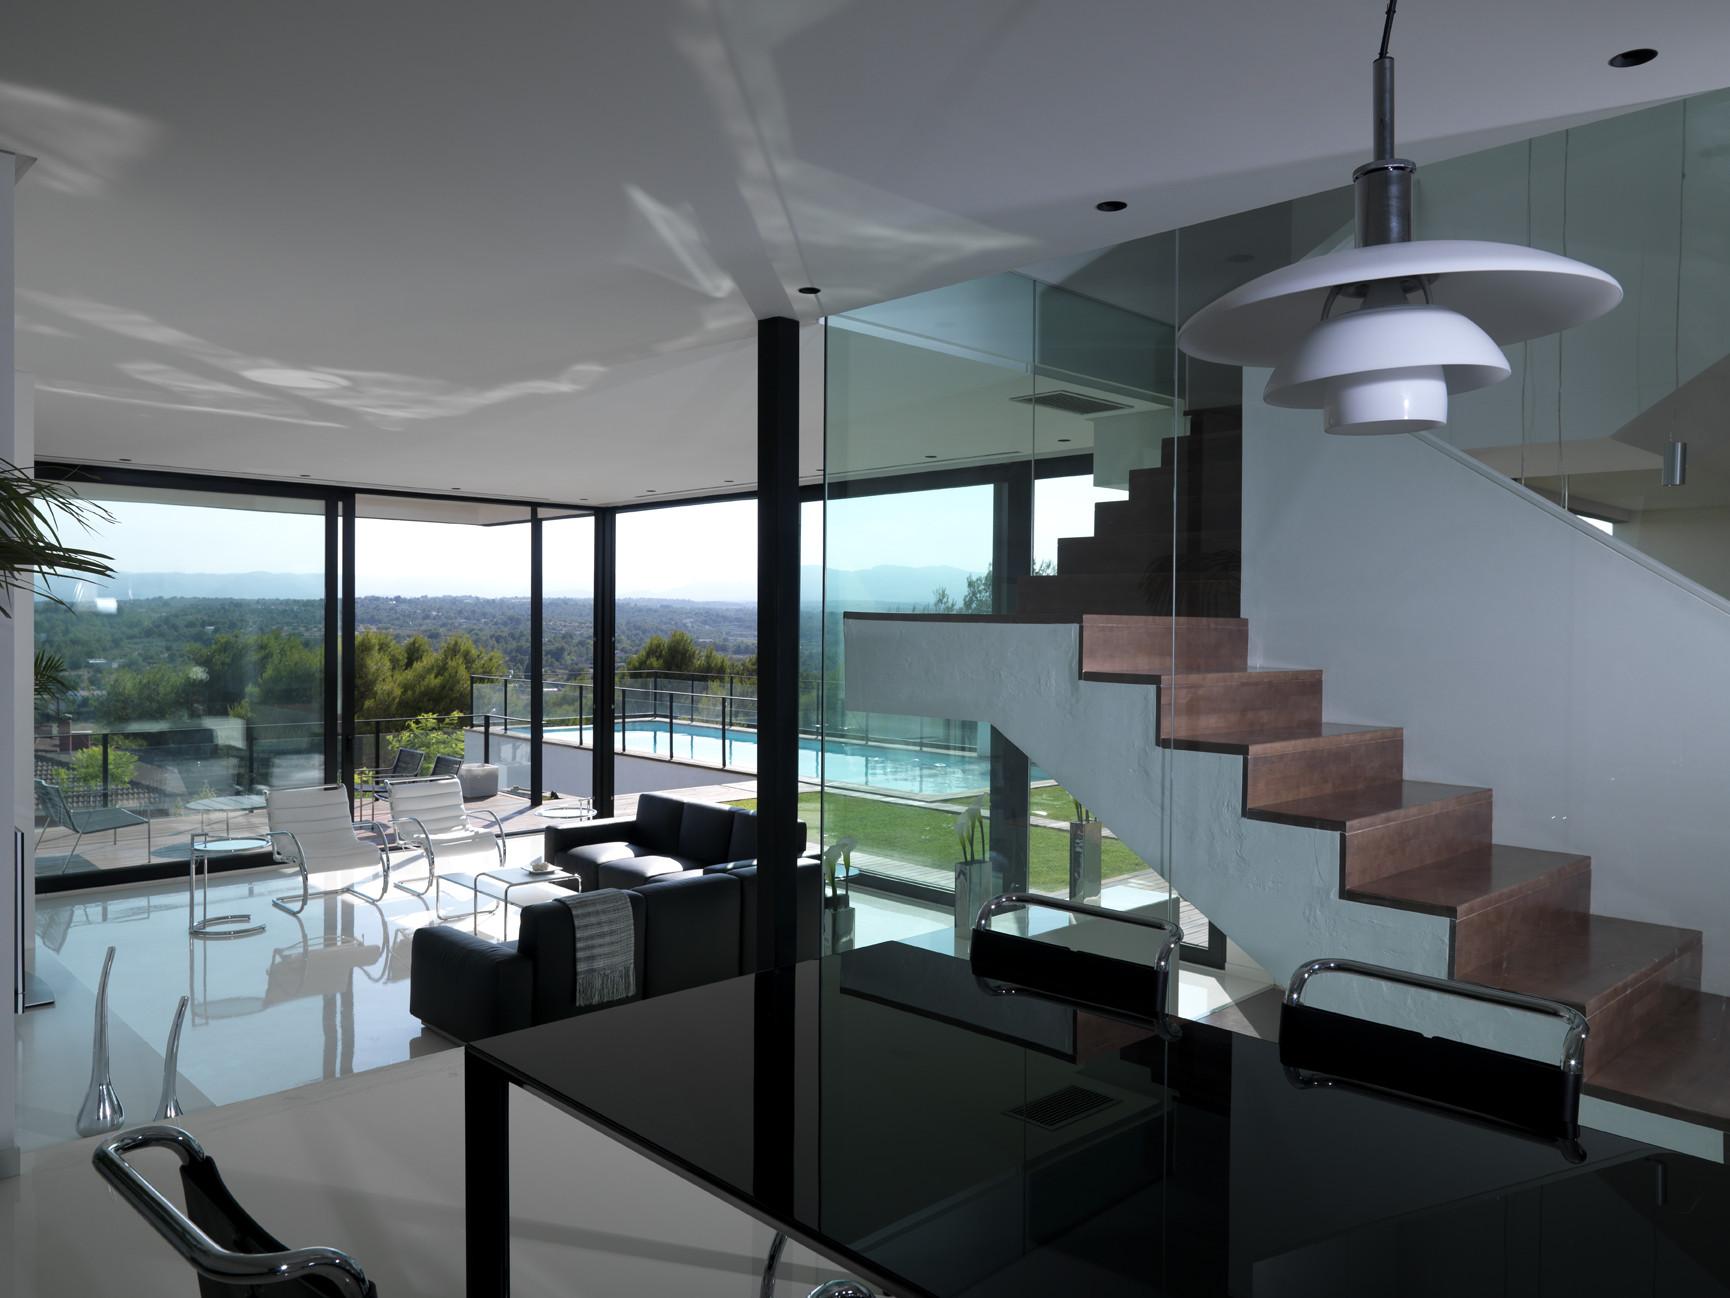 Galeria de casa time ladaa 13 for Interior house designs black and white